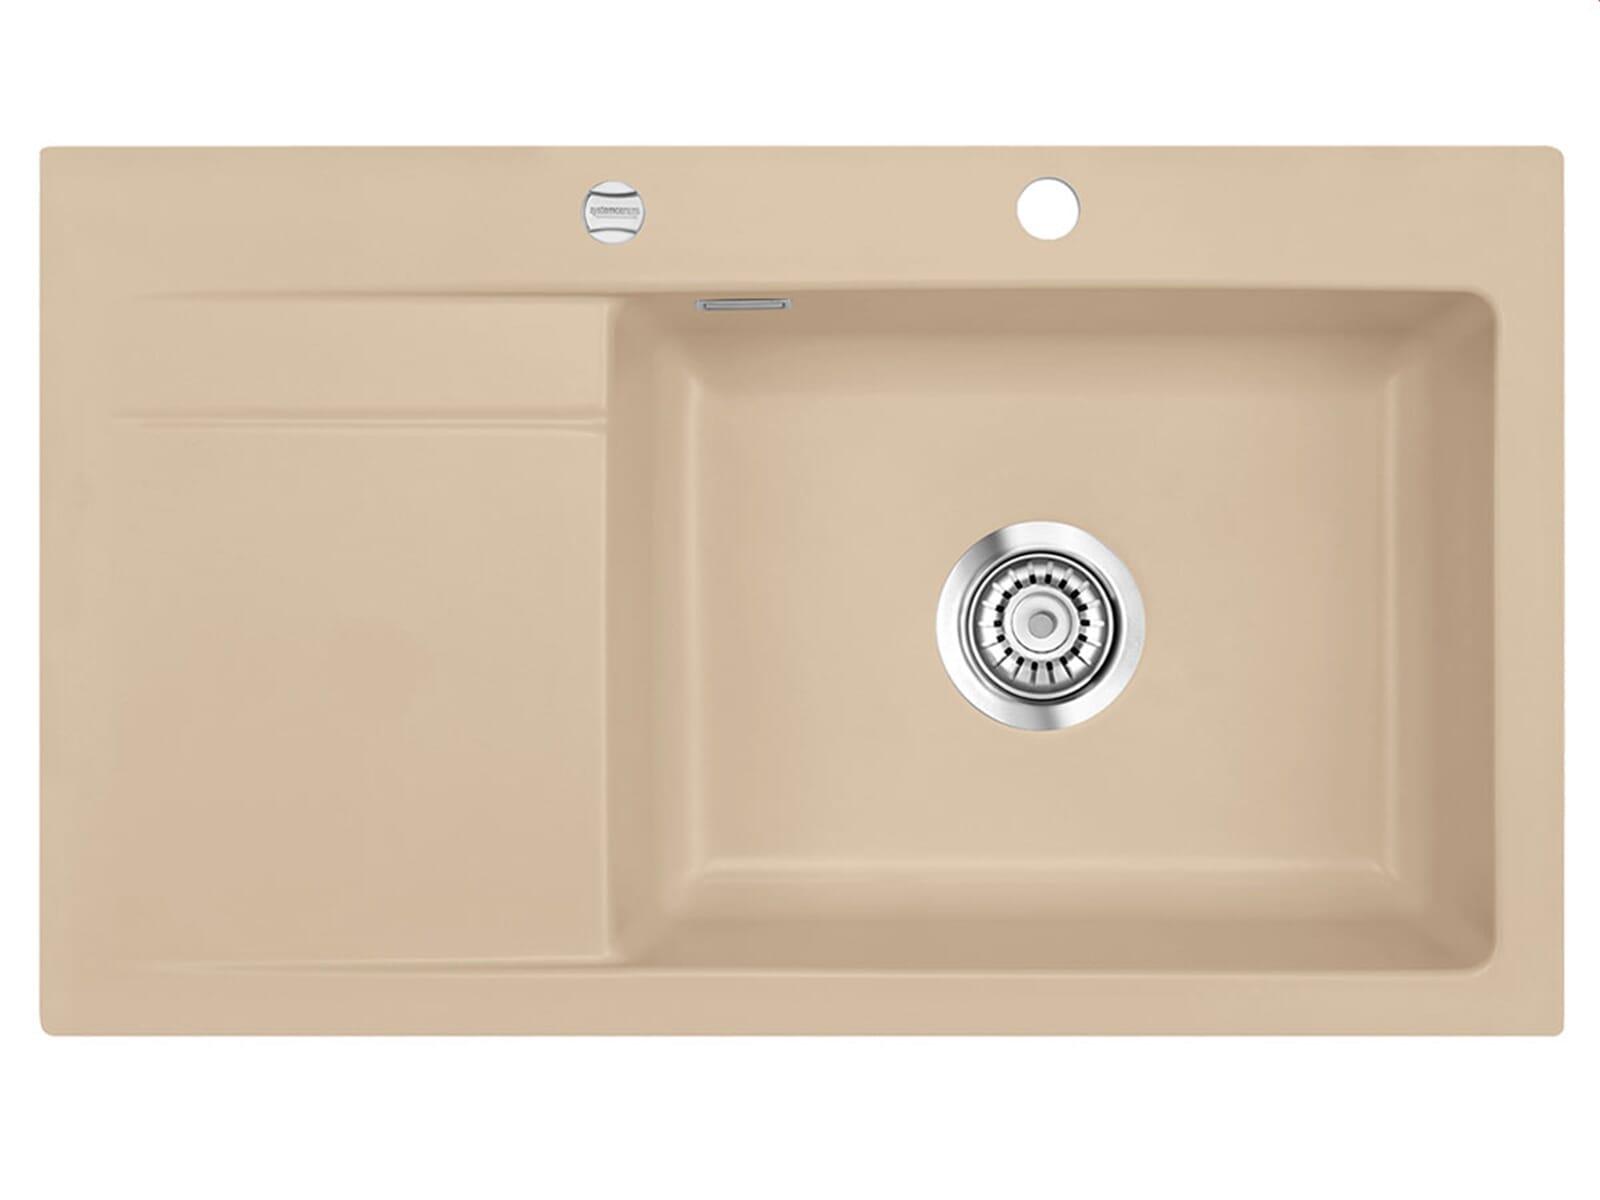 Systemceram Stema 86 SL Sand Keramikspüle Excenterbetätigung